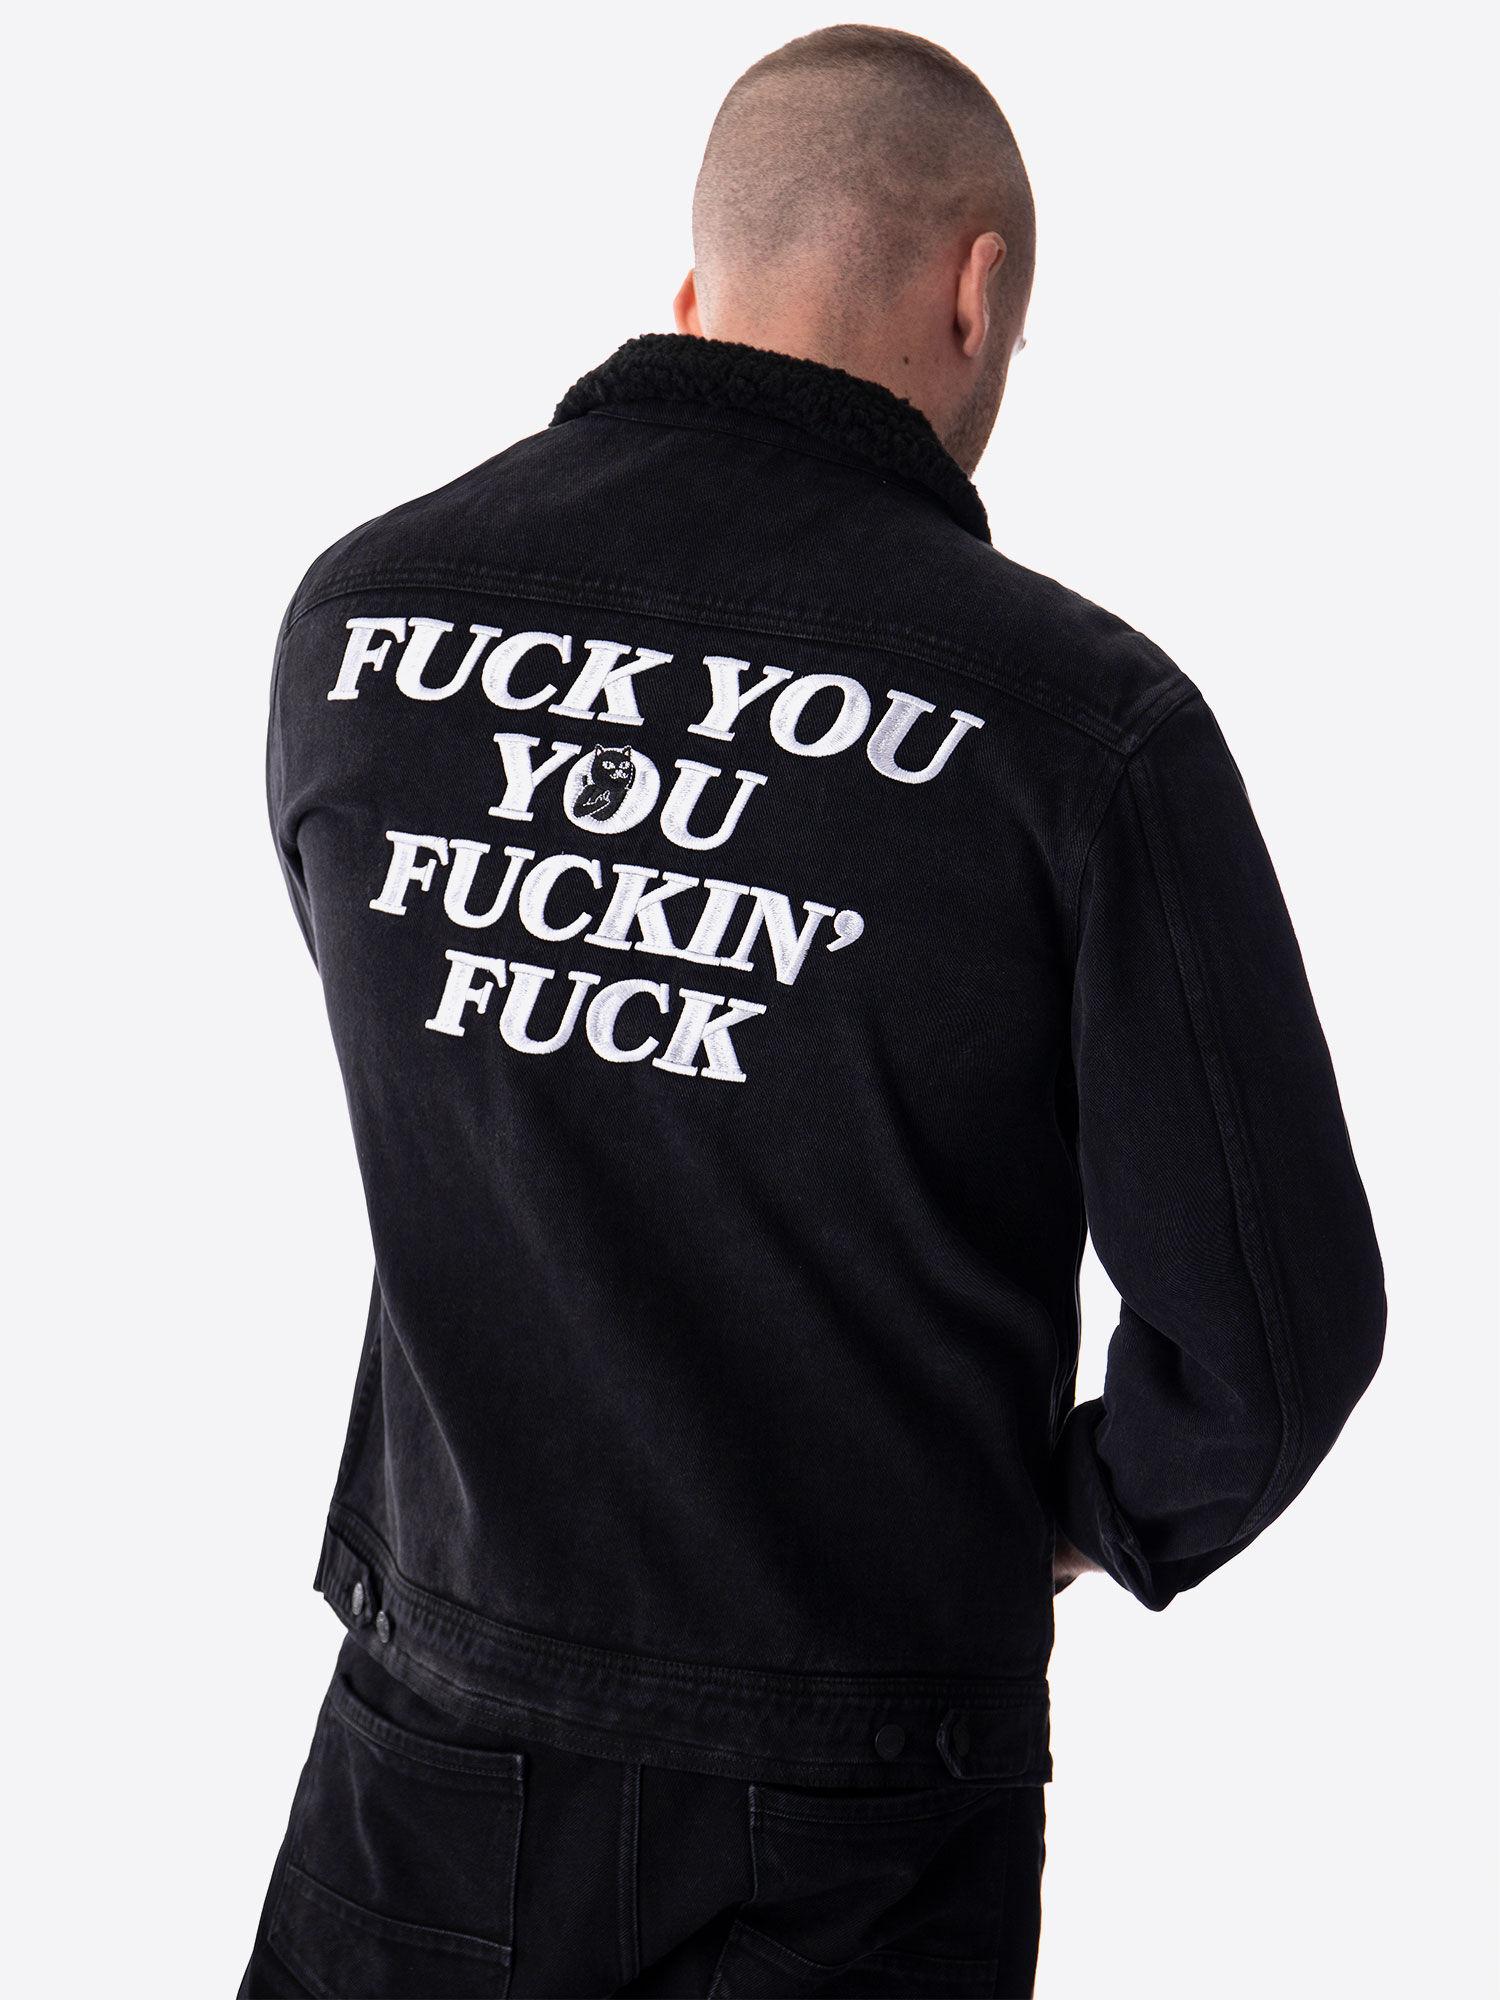 Fucking Fuck